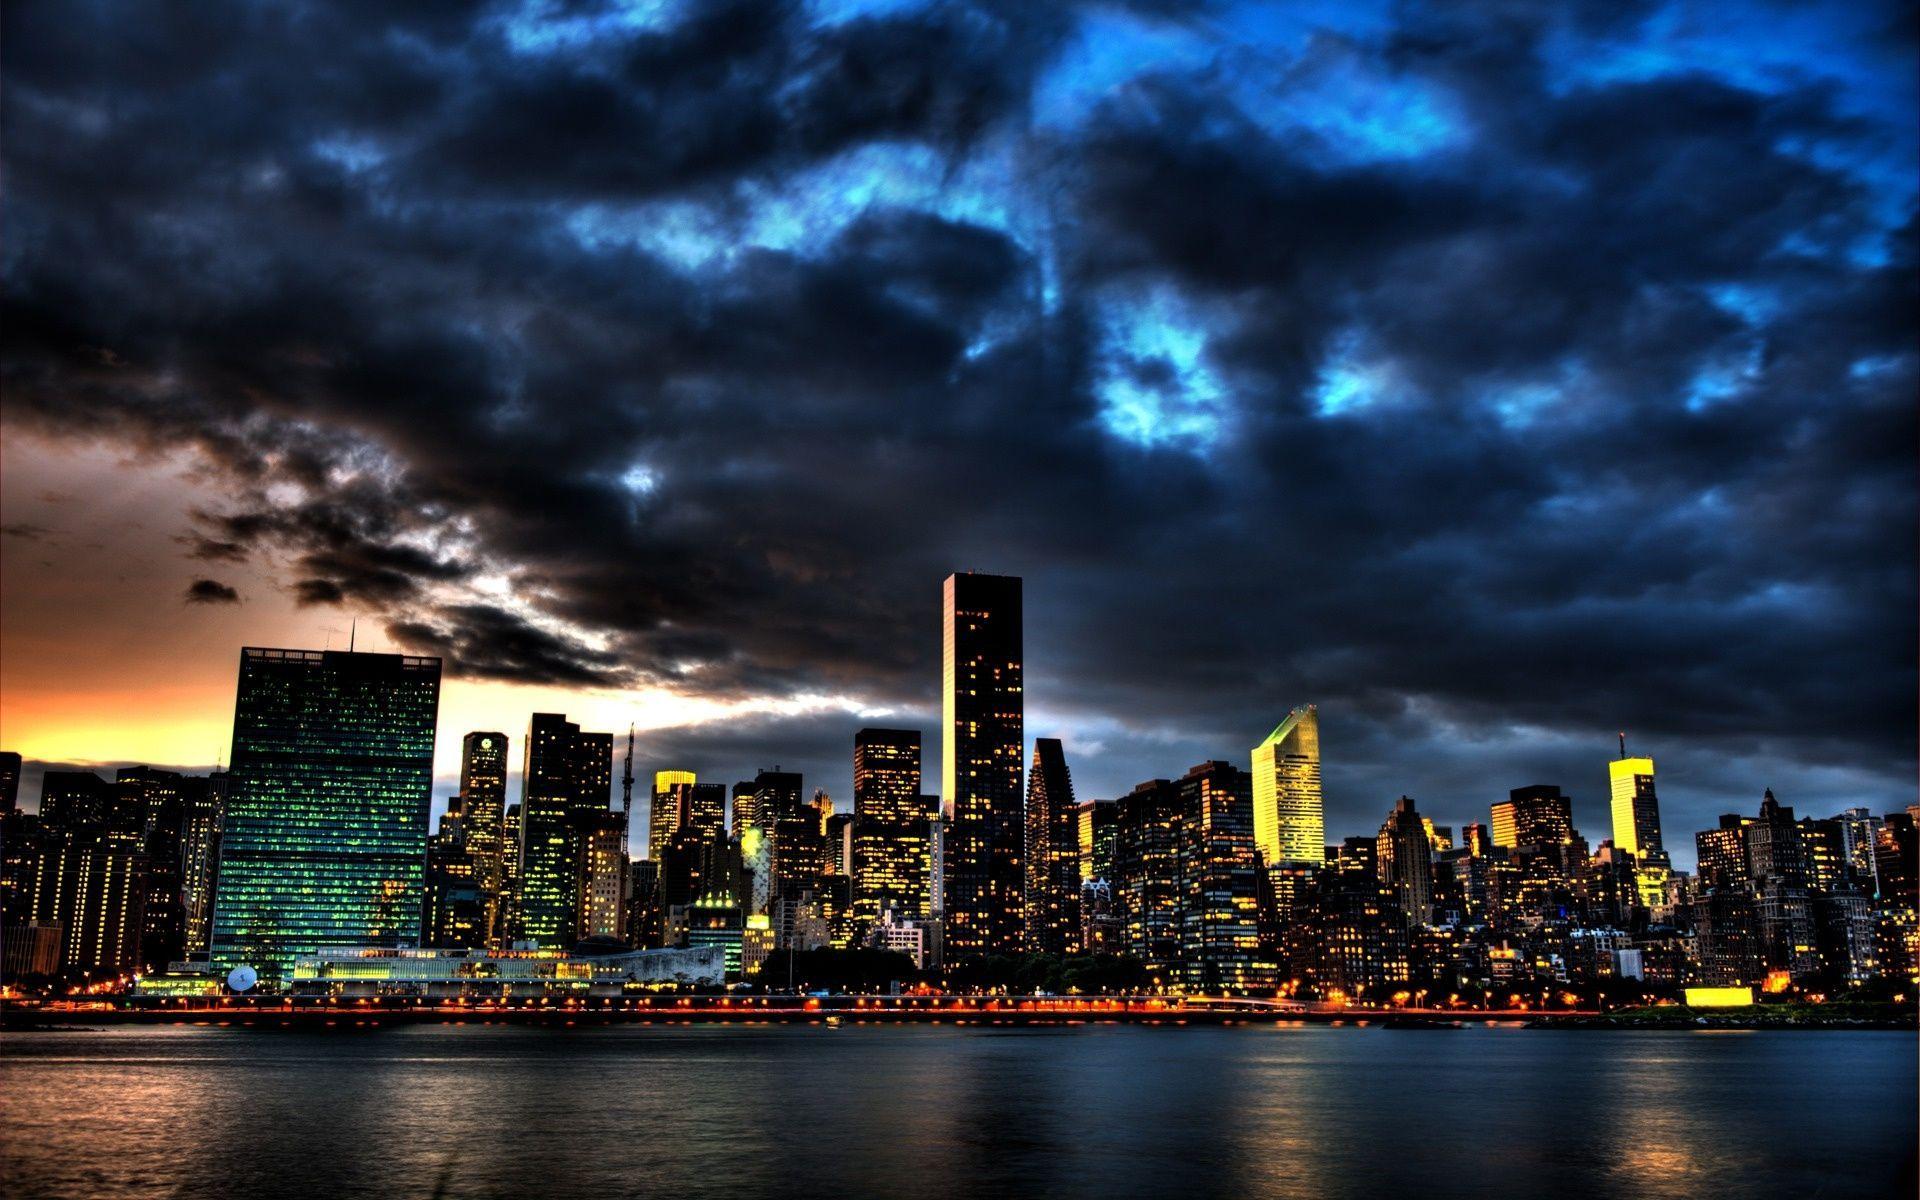 pin city nightlife wallpaper - photo #9